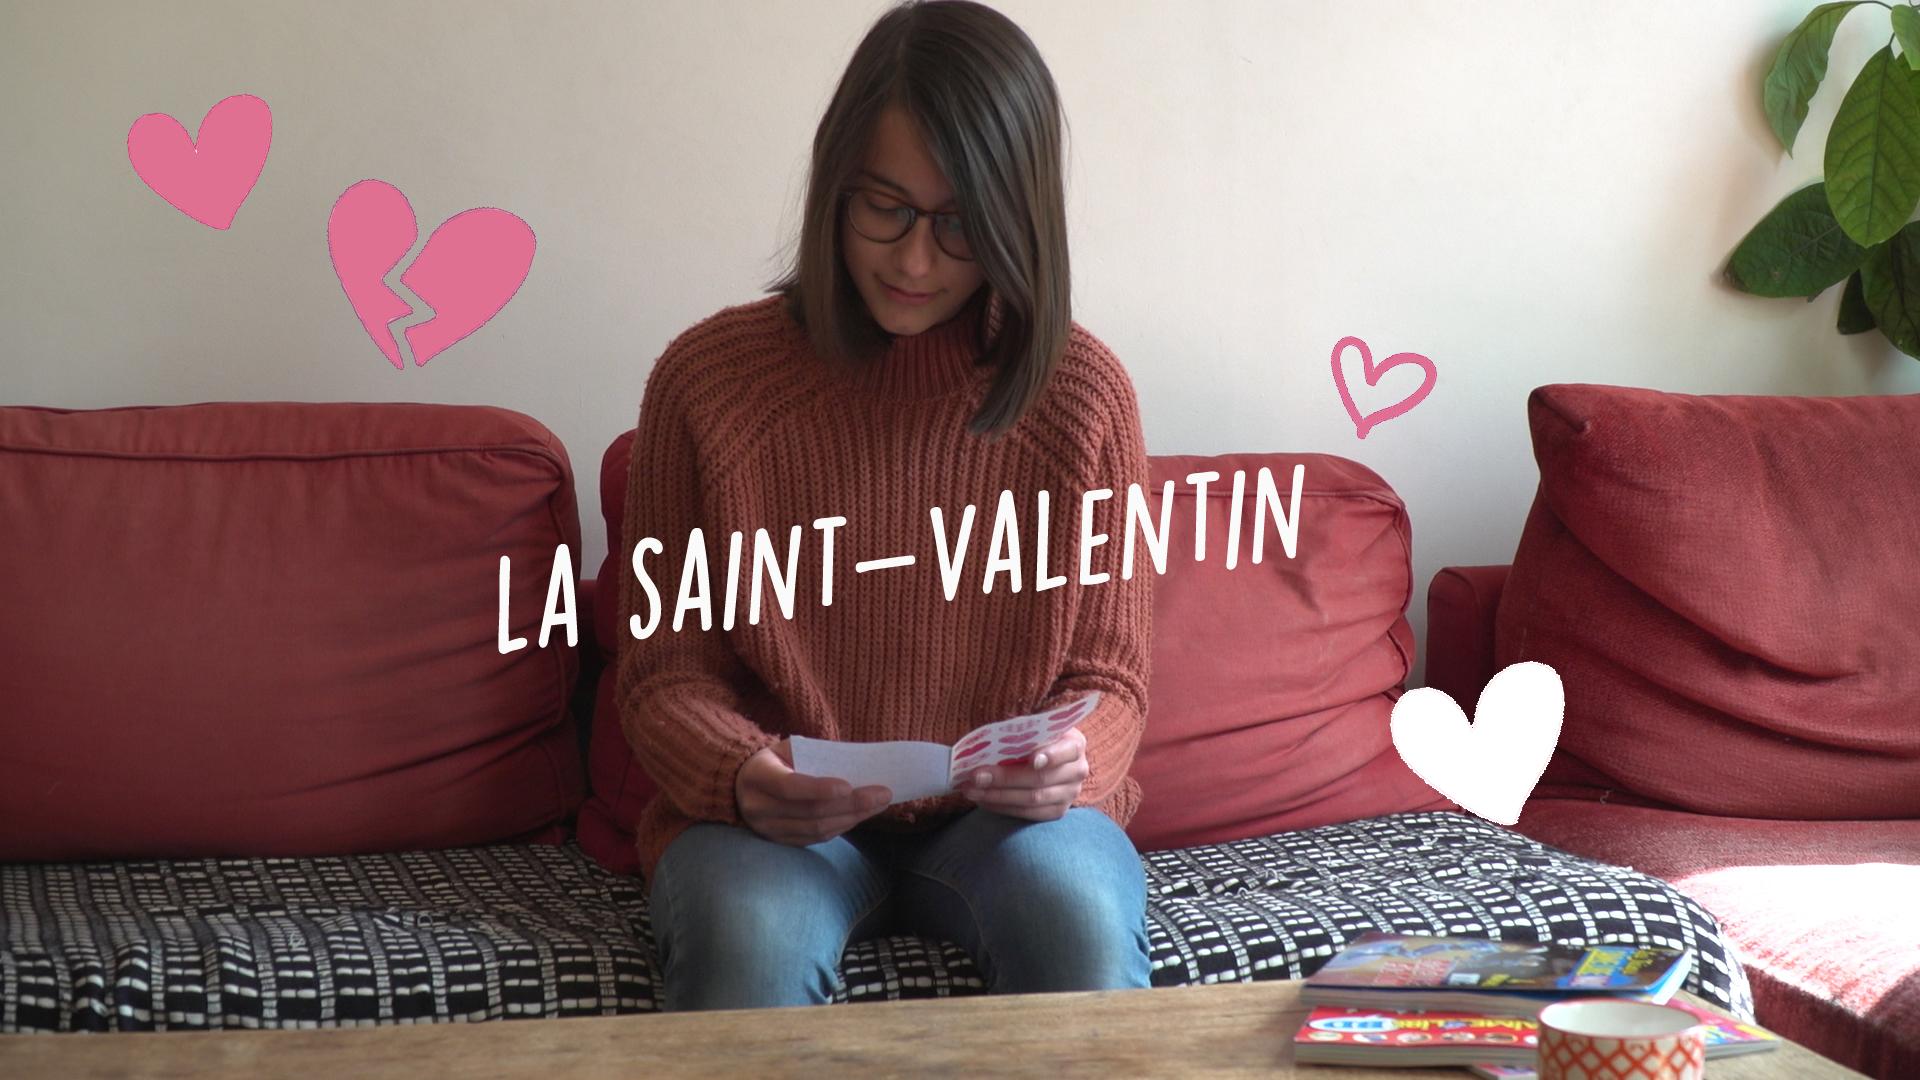 La Saint-Valentin screenshot